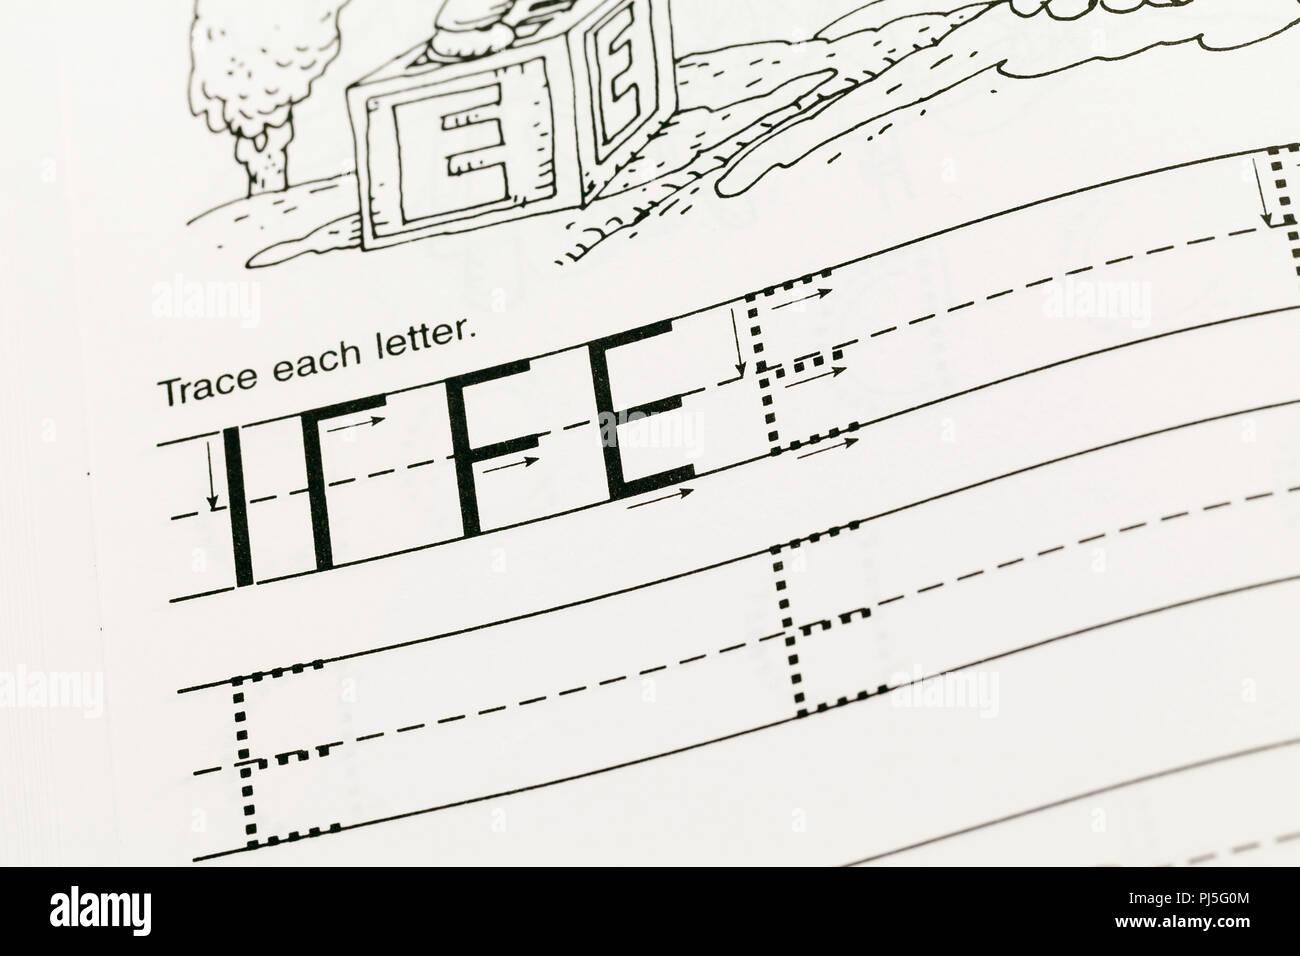 Preschool English writing workbook - USA - Stock Image